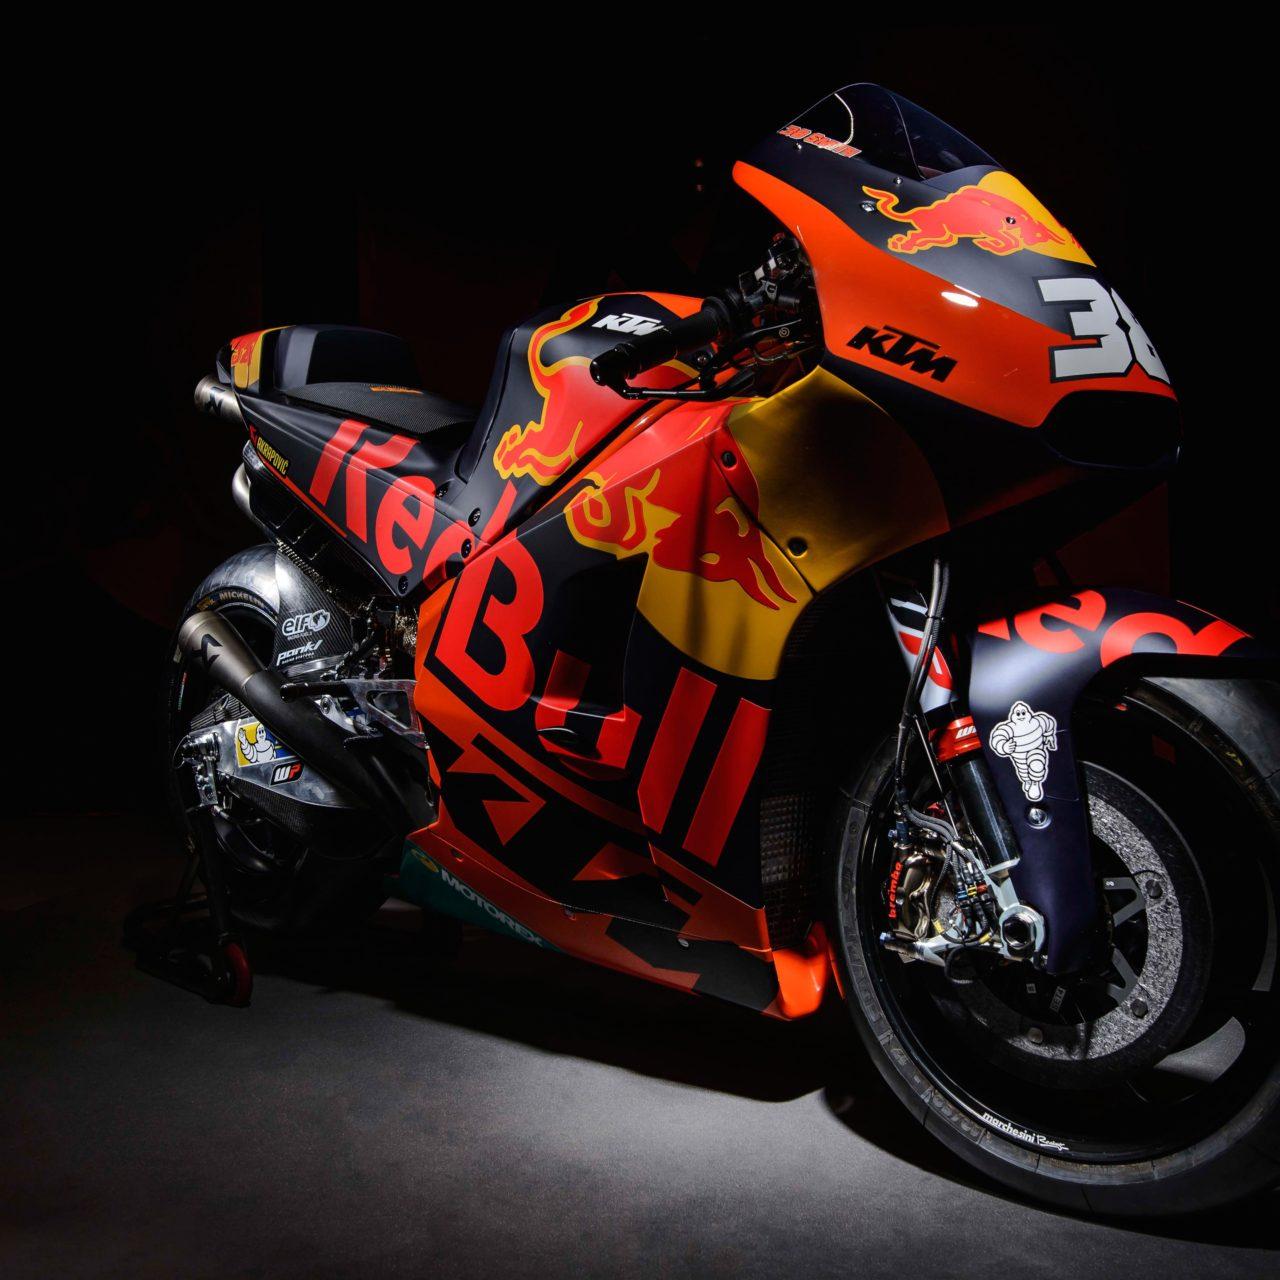 2017 KTM RC16 MotoGP Race Bike Wallpapers